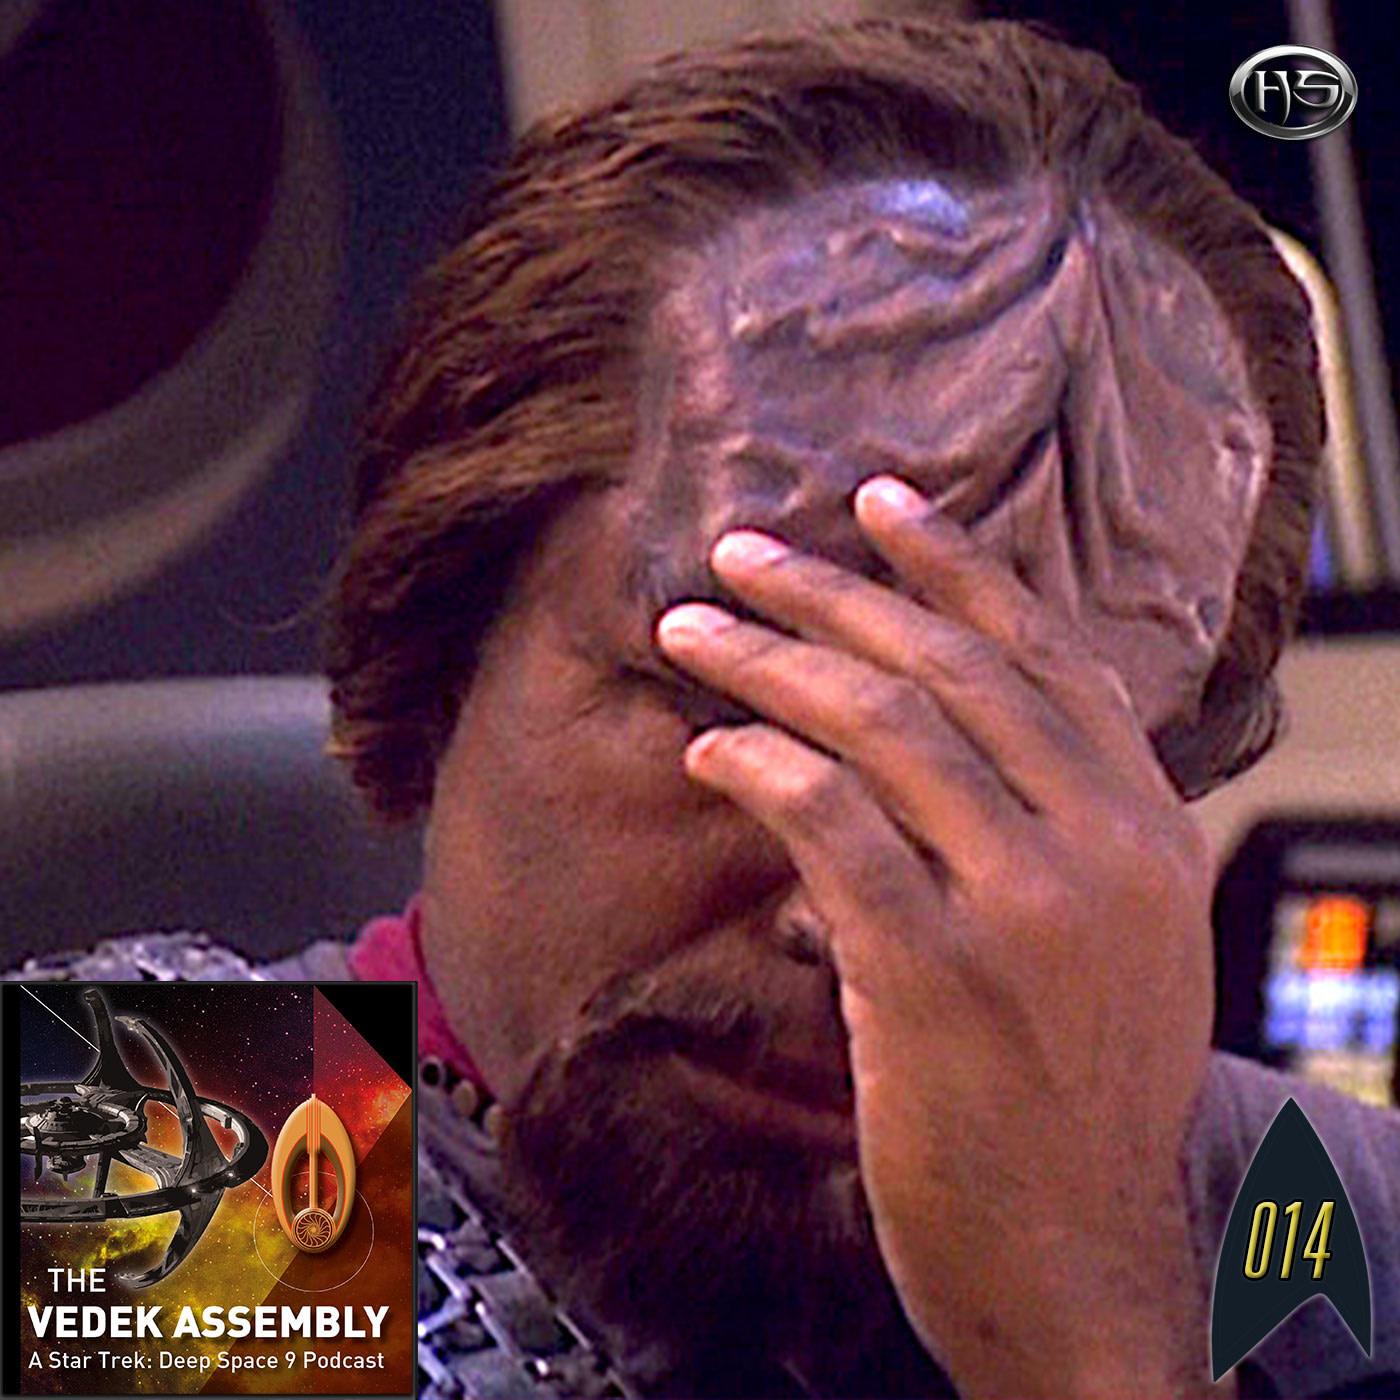 The Vedek Assembly Episode 14